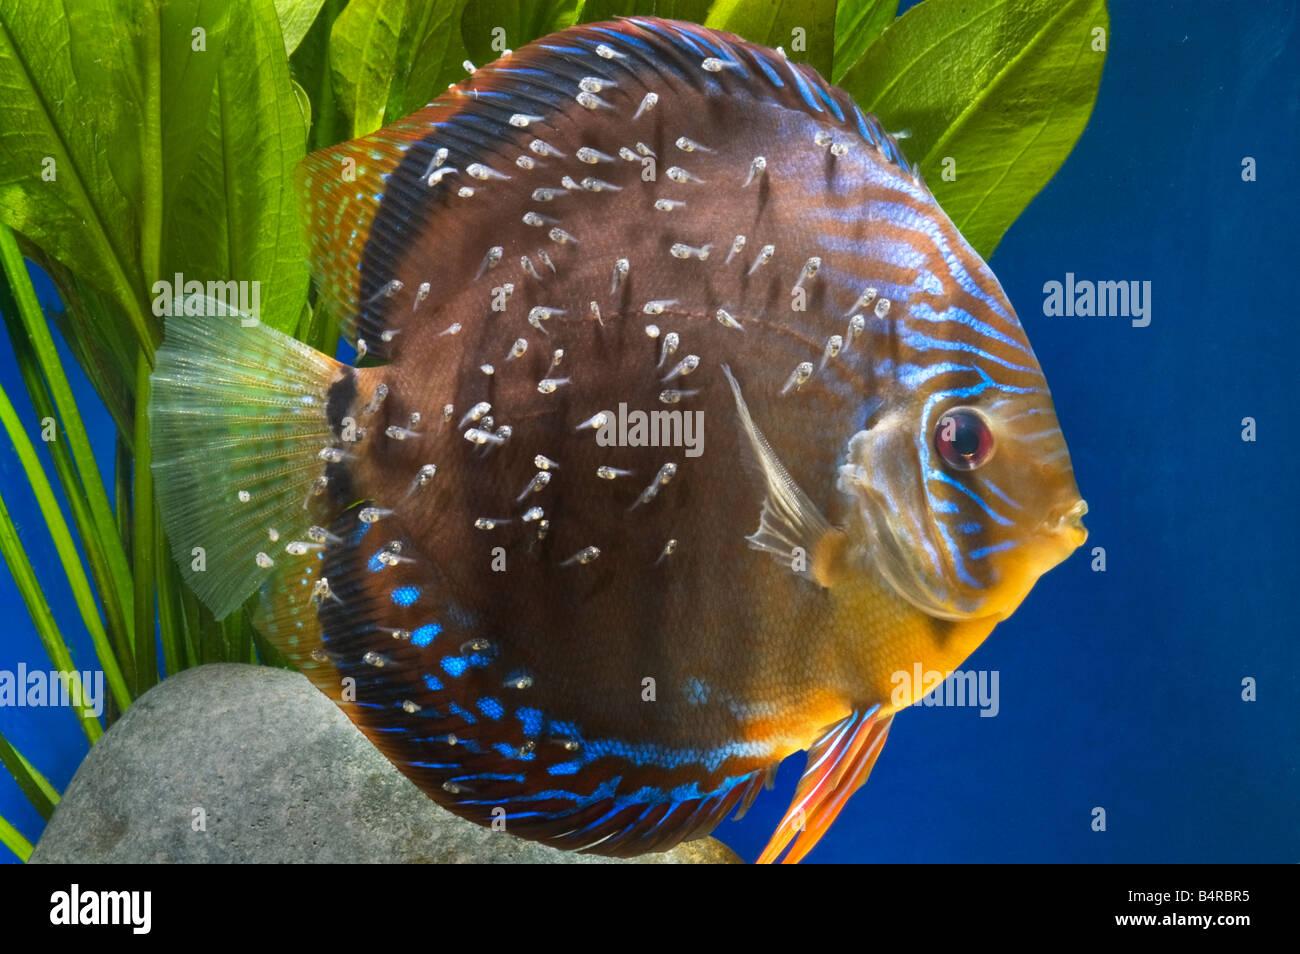 Aninimal Book: Breeding Cichlid Stock Photos & Breeding Cichlid Stock ...